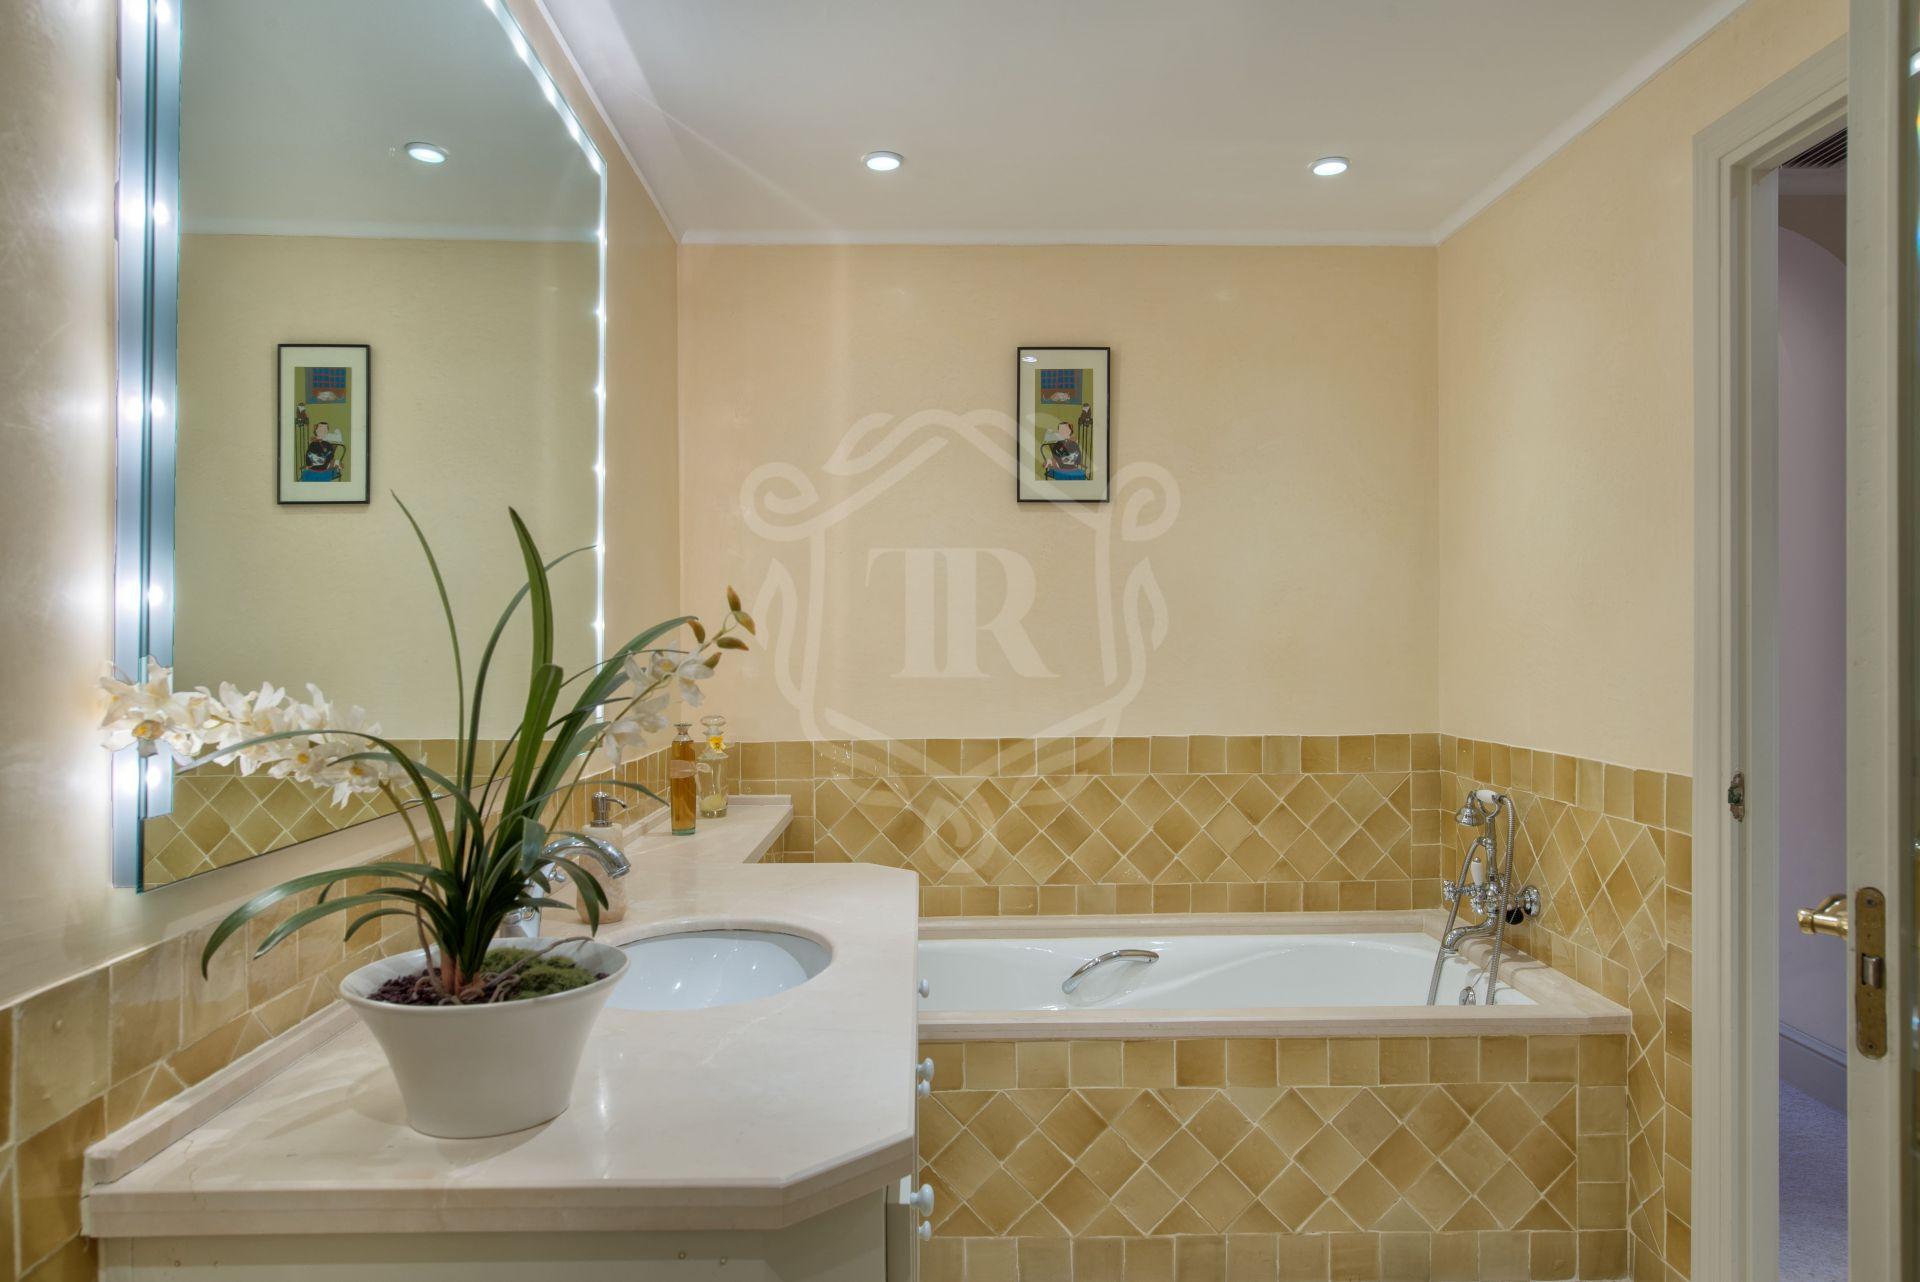 Ground Floor Apartment for sale in Ventura del Mar, Marbella - Puerto Banus